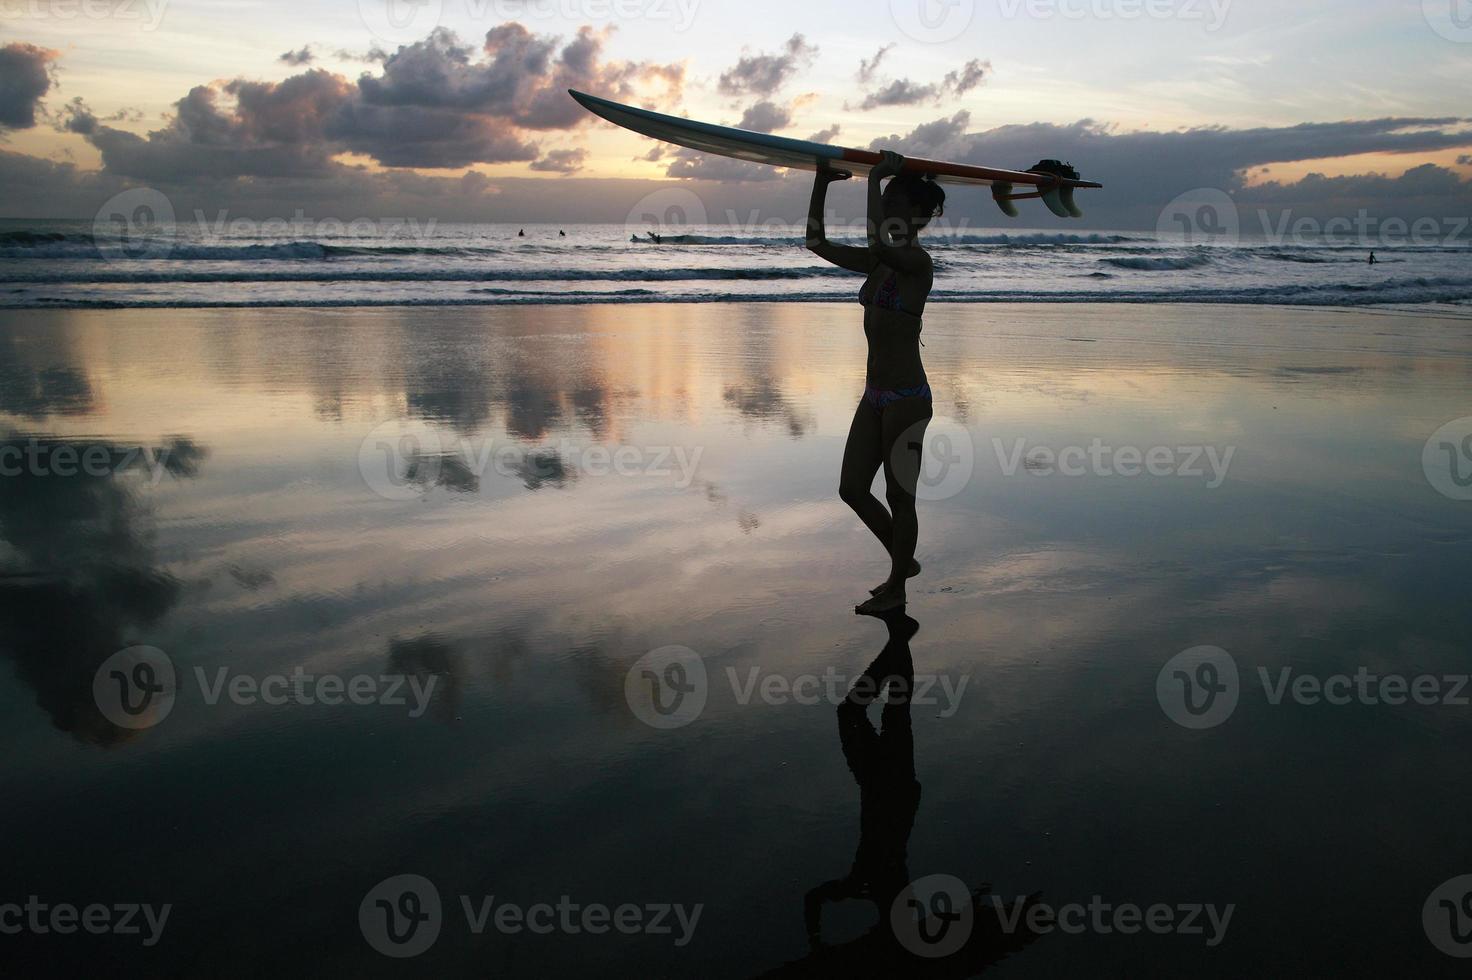 chica surfista con tabla de surf foto